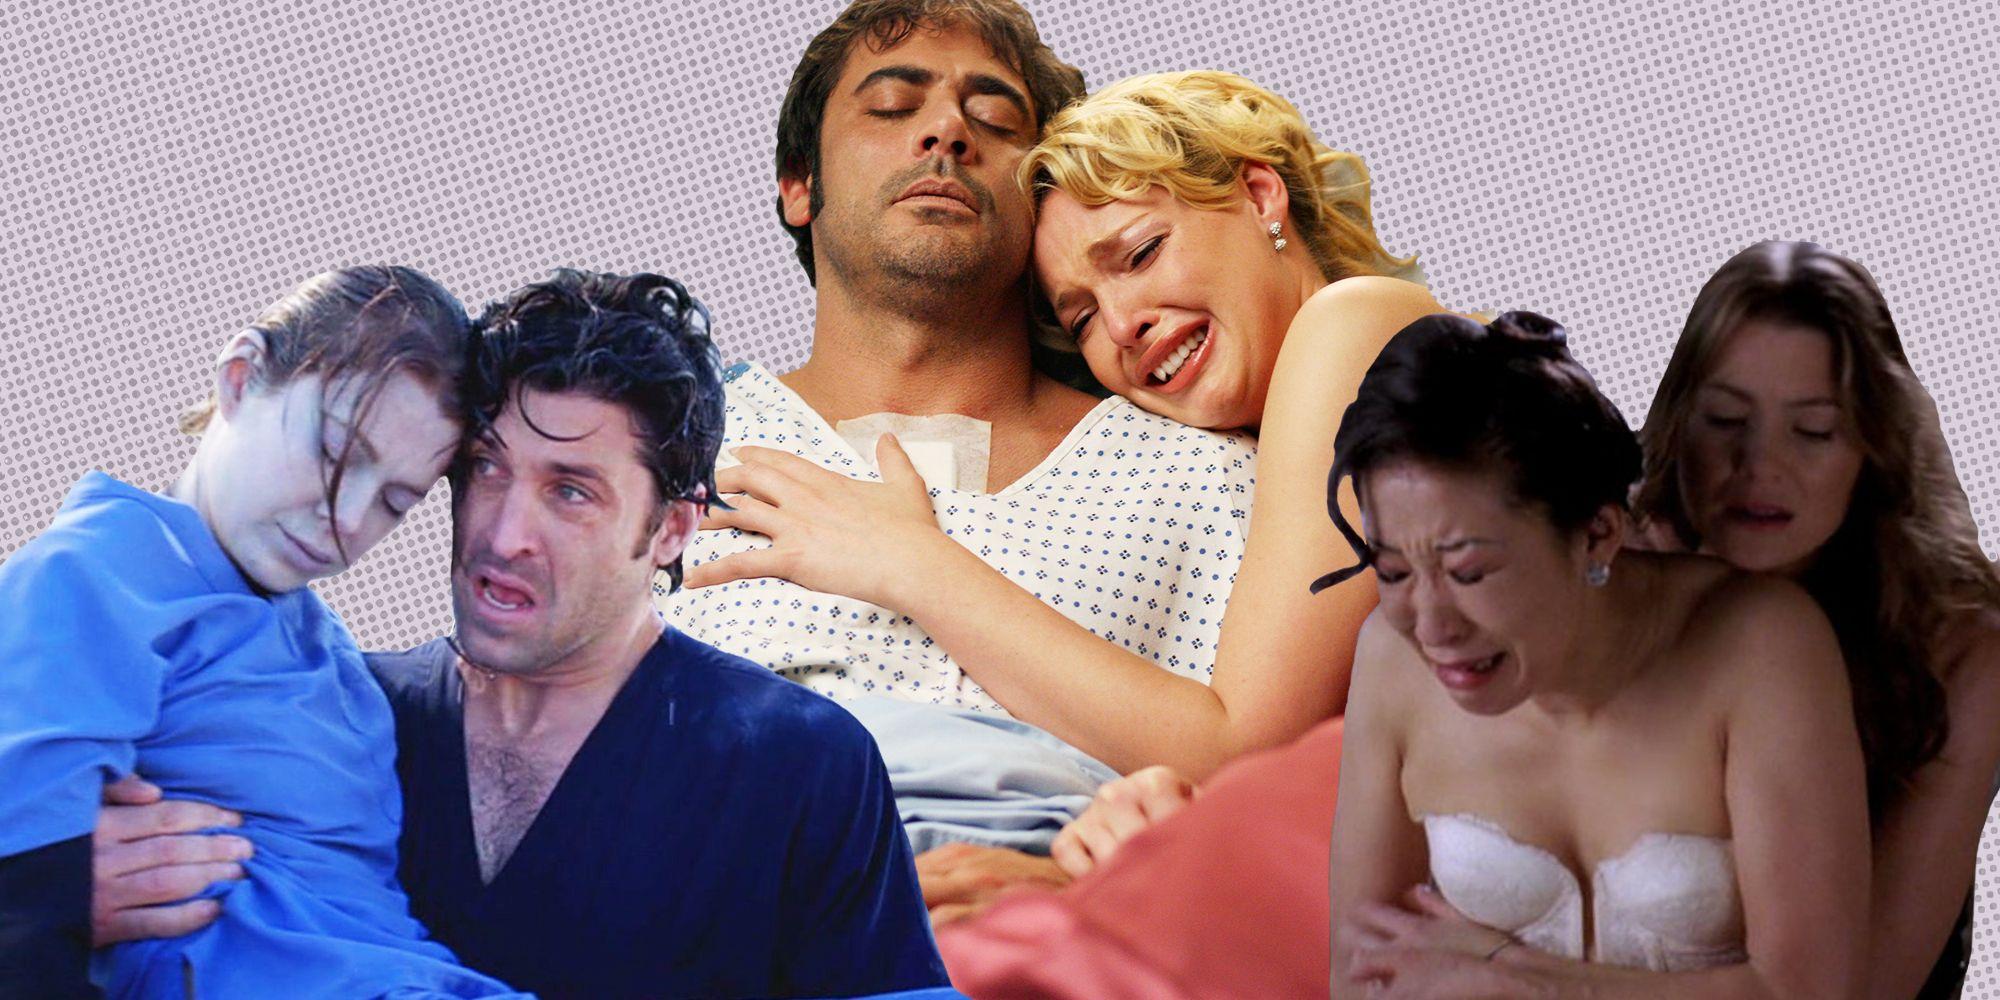 15 Best Grey's Anatomy Meltdowns - Most Emotional Grey's ...